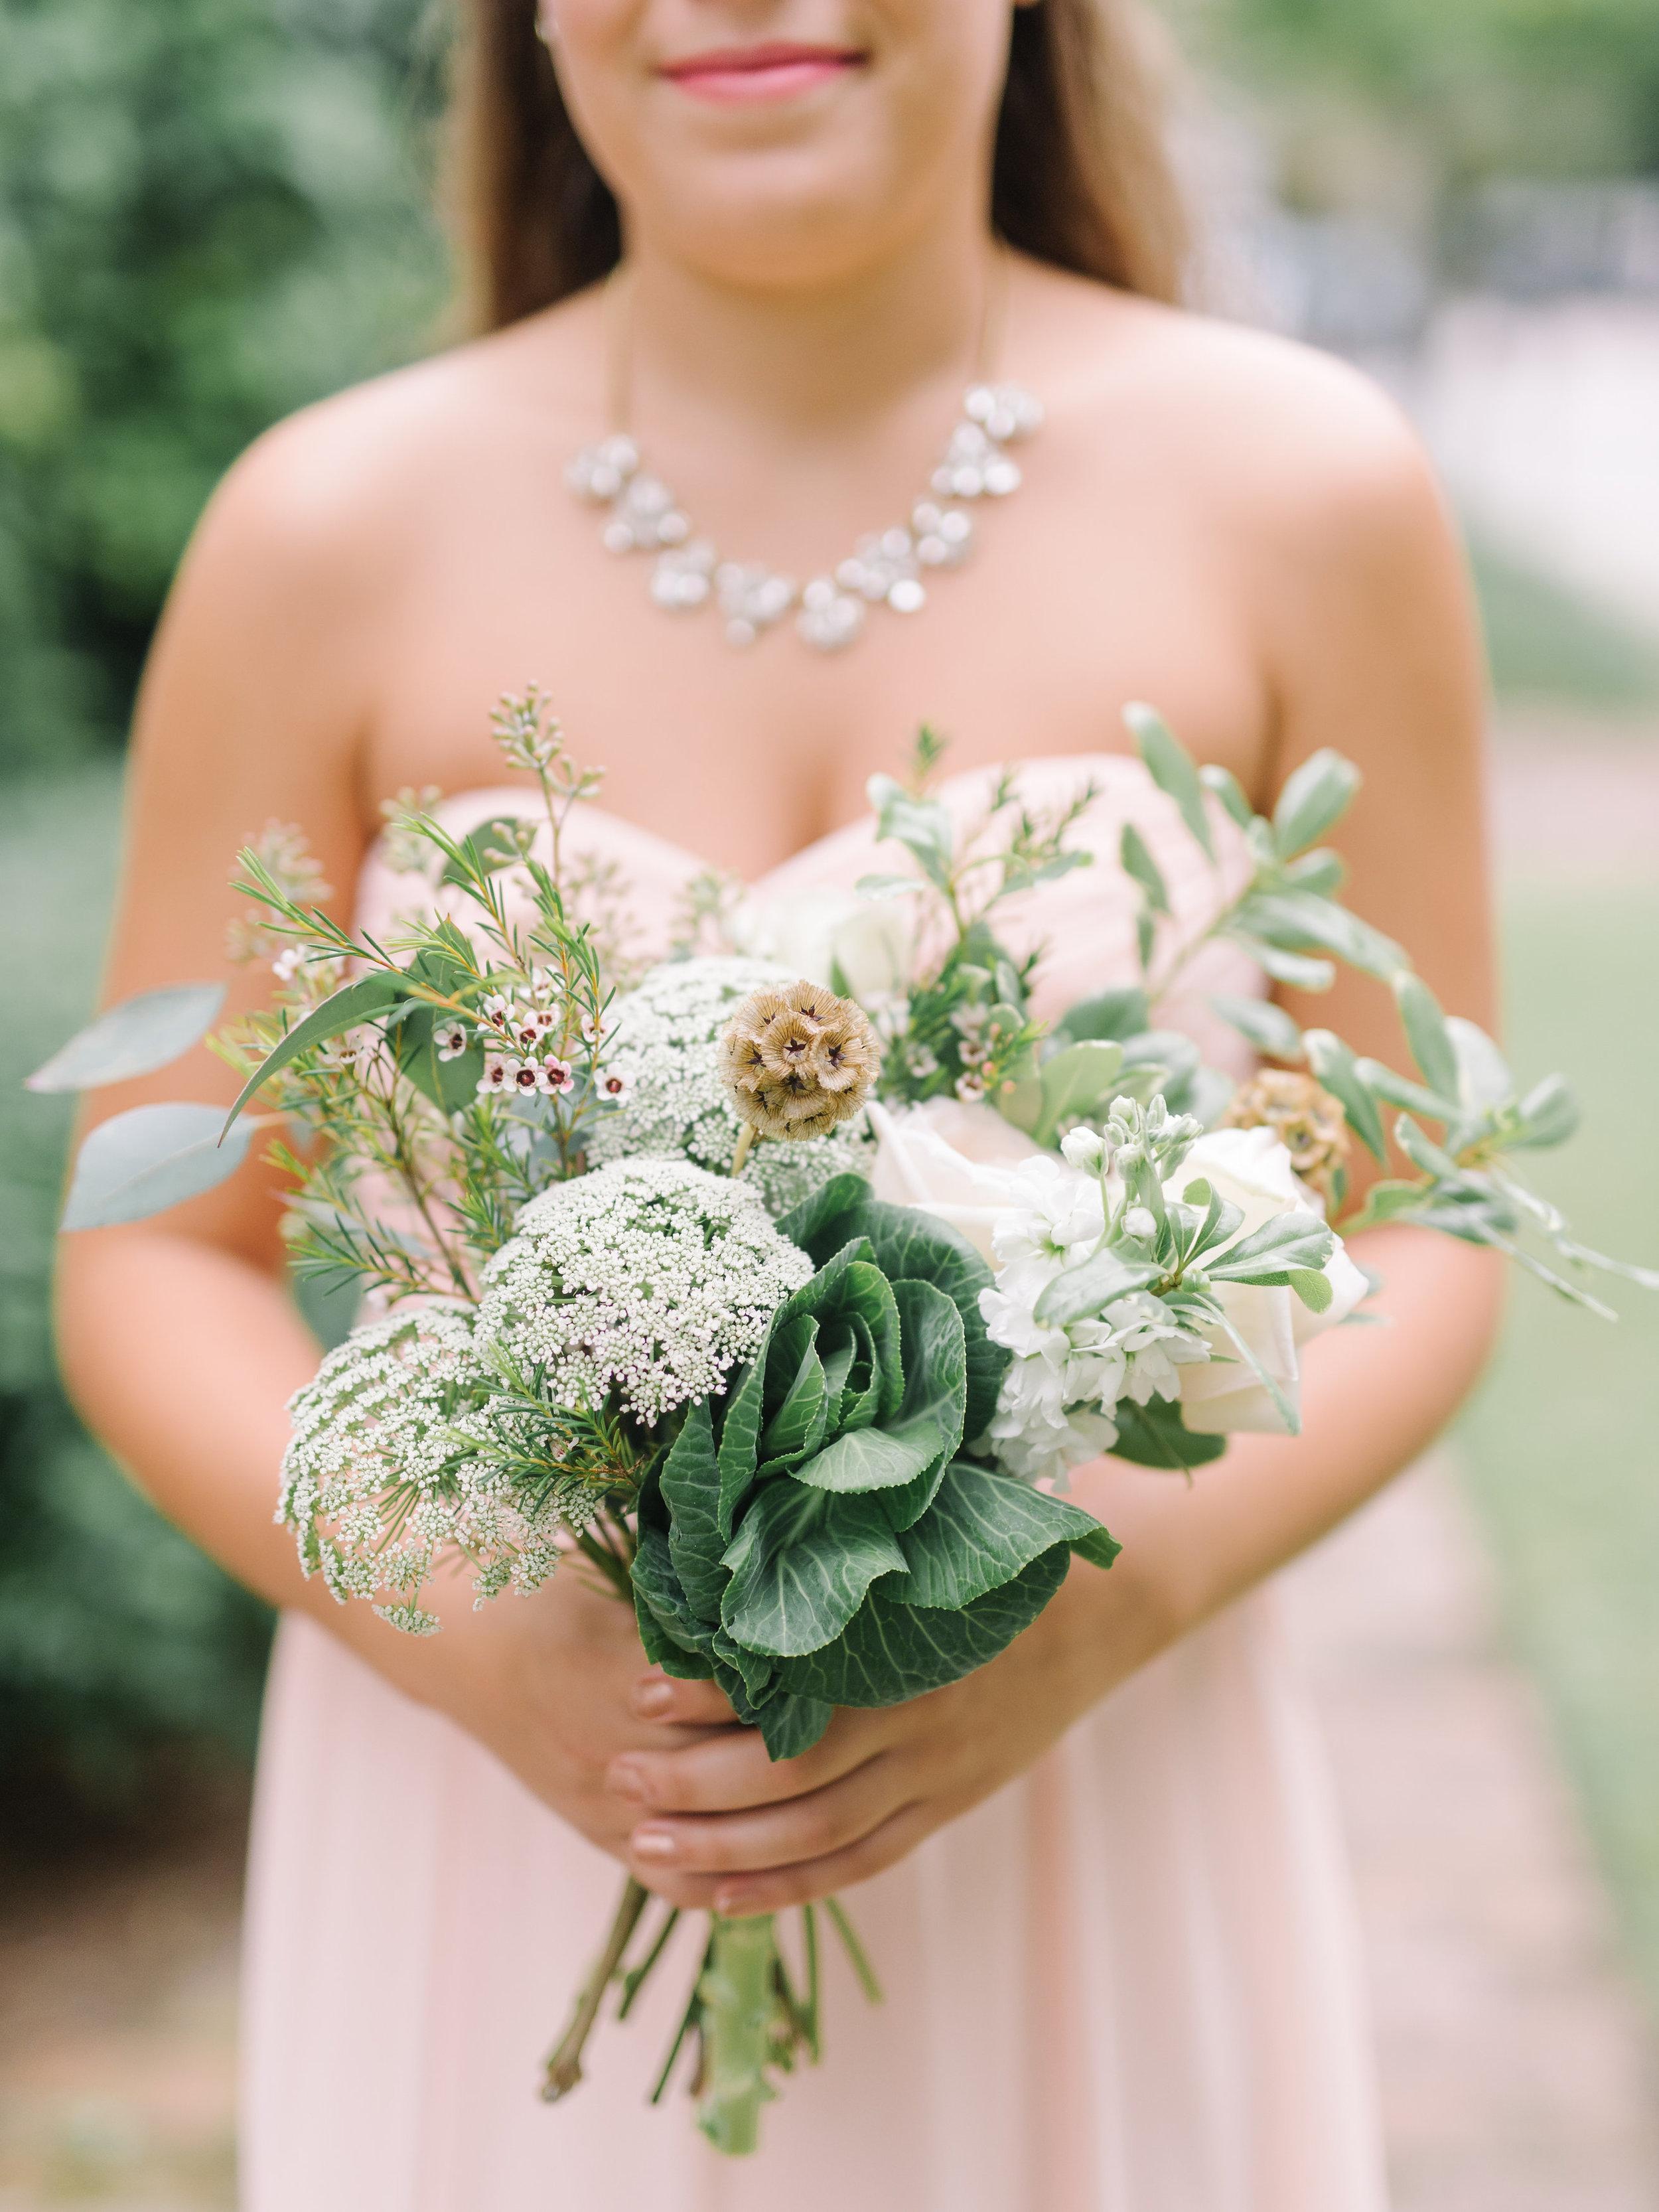 amber-and-paul-rach-loves-troy-charles-h-morris-center-wedding-sarah-seven-helene-lace-wedding-dress-ivory-and-beau-bridal-boutique-savannah-wedding-planner-savannah-event-designer-savannah-florist-savannah-weddings-savannah-bridal-boutique-21.jpg